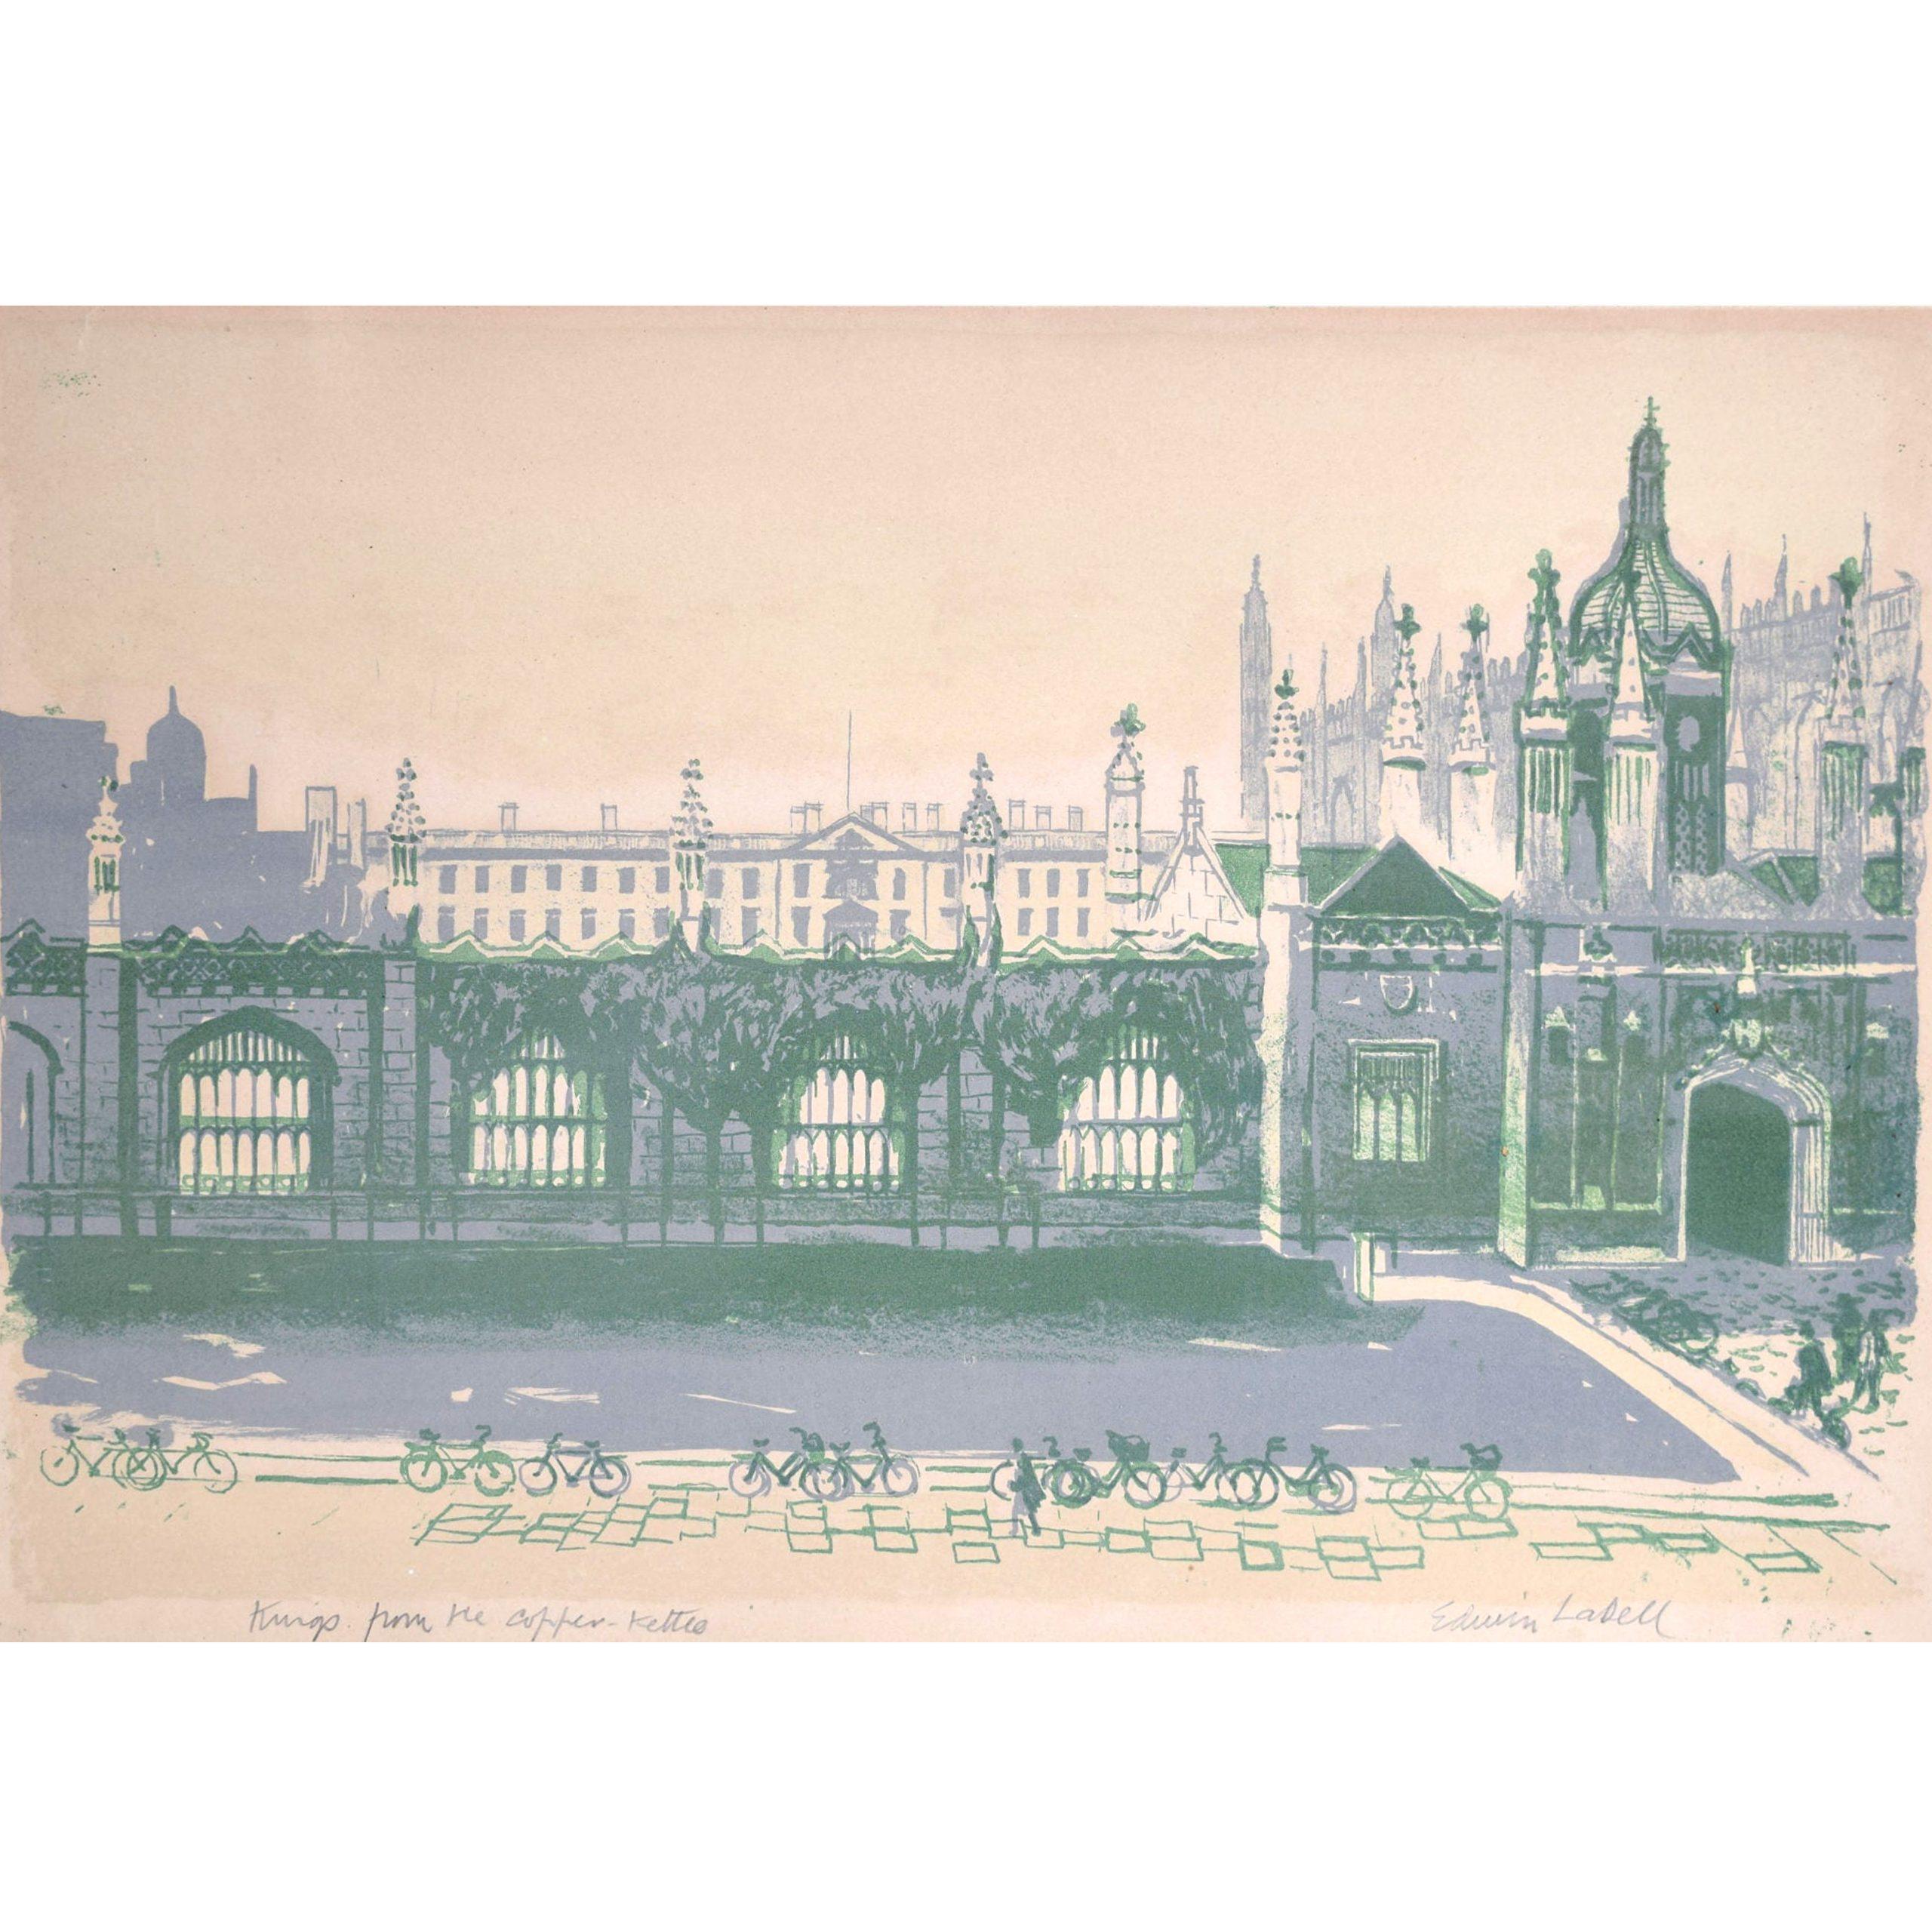 Edwin La Dell Cambridge King's College from Copper Kettle Signed Lithograph